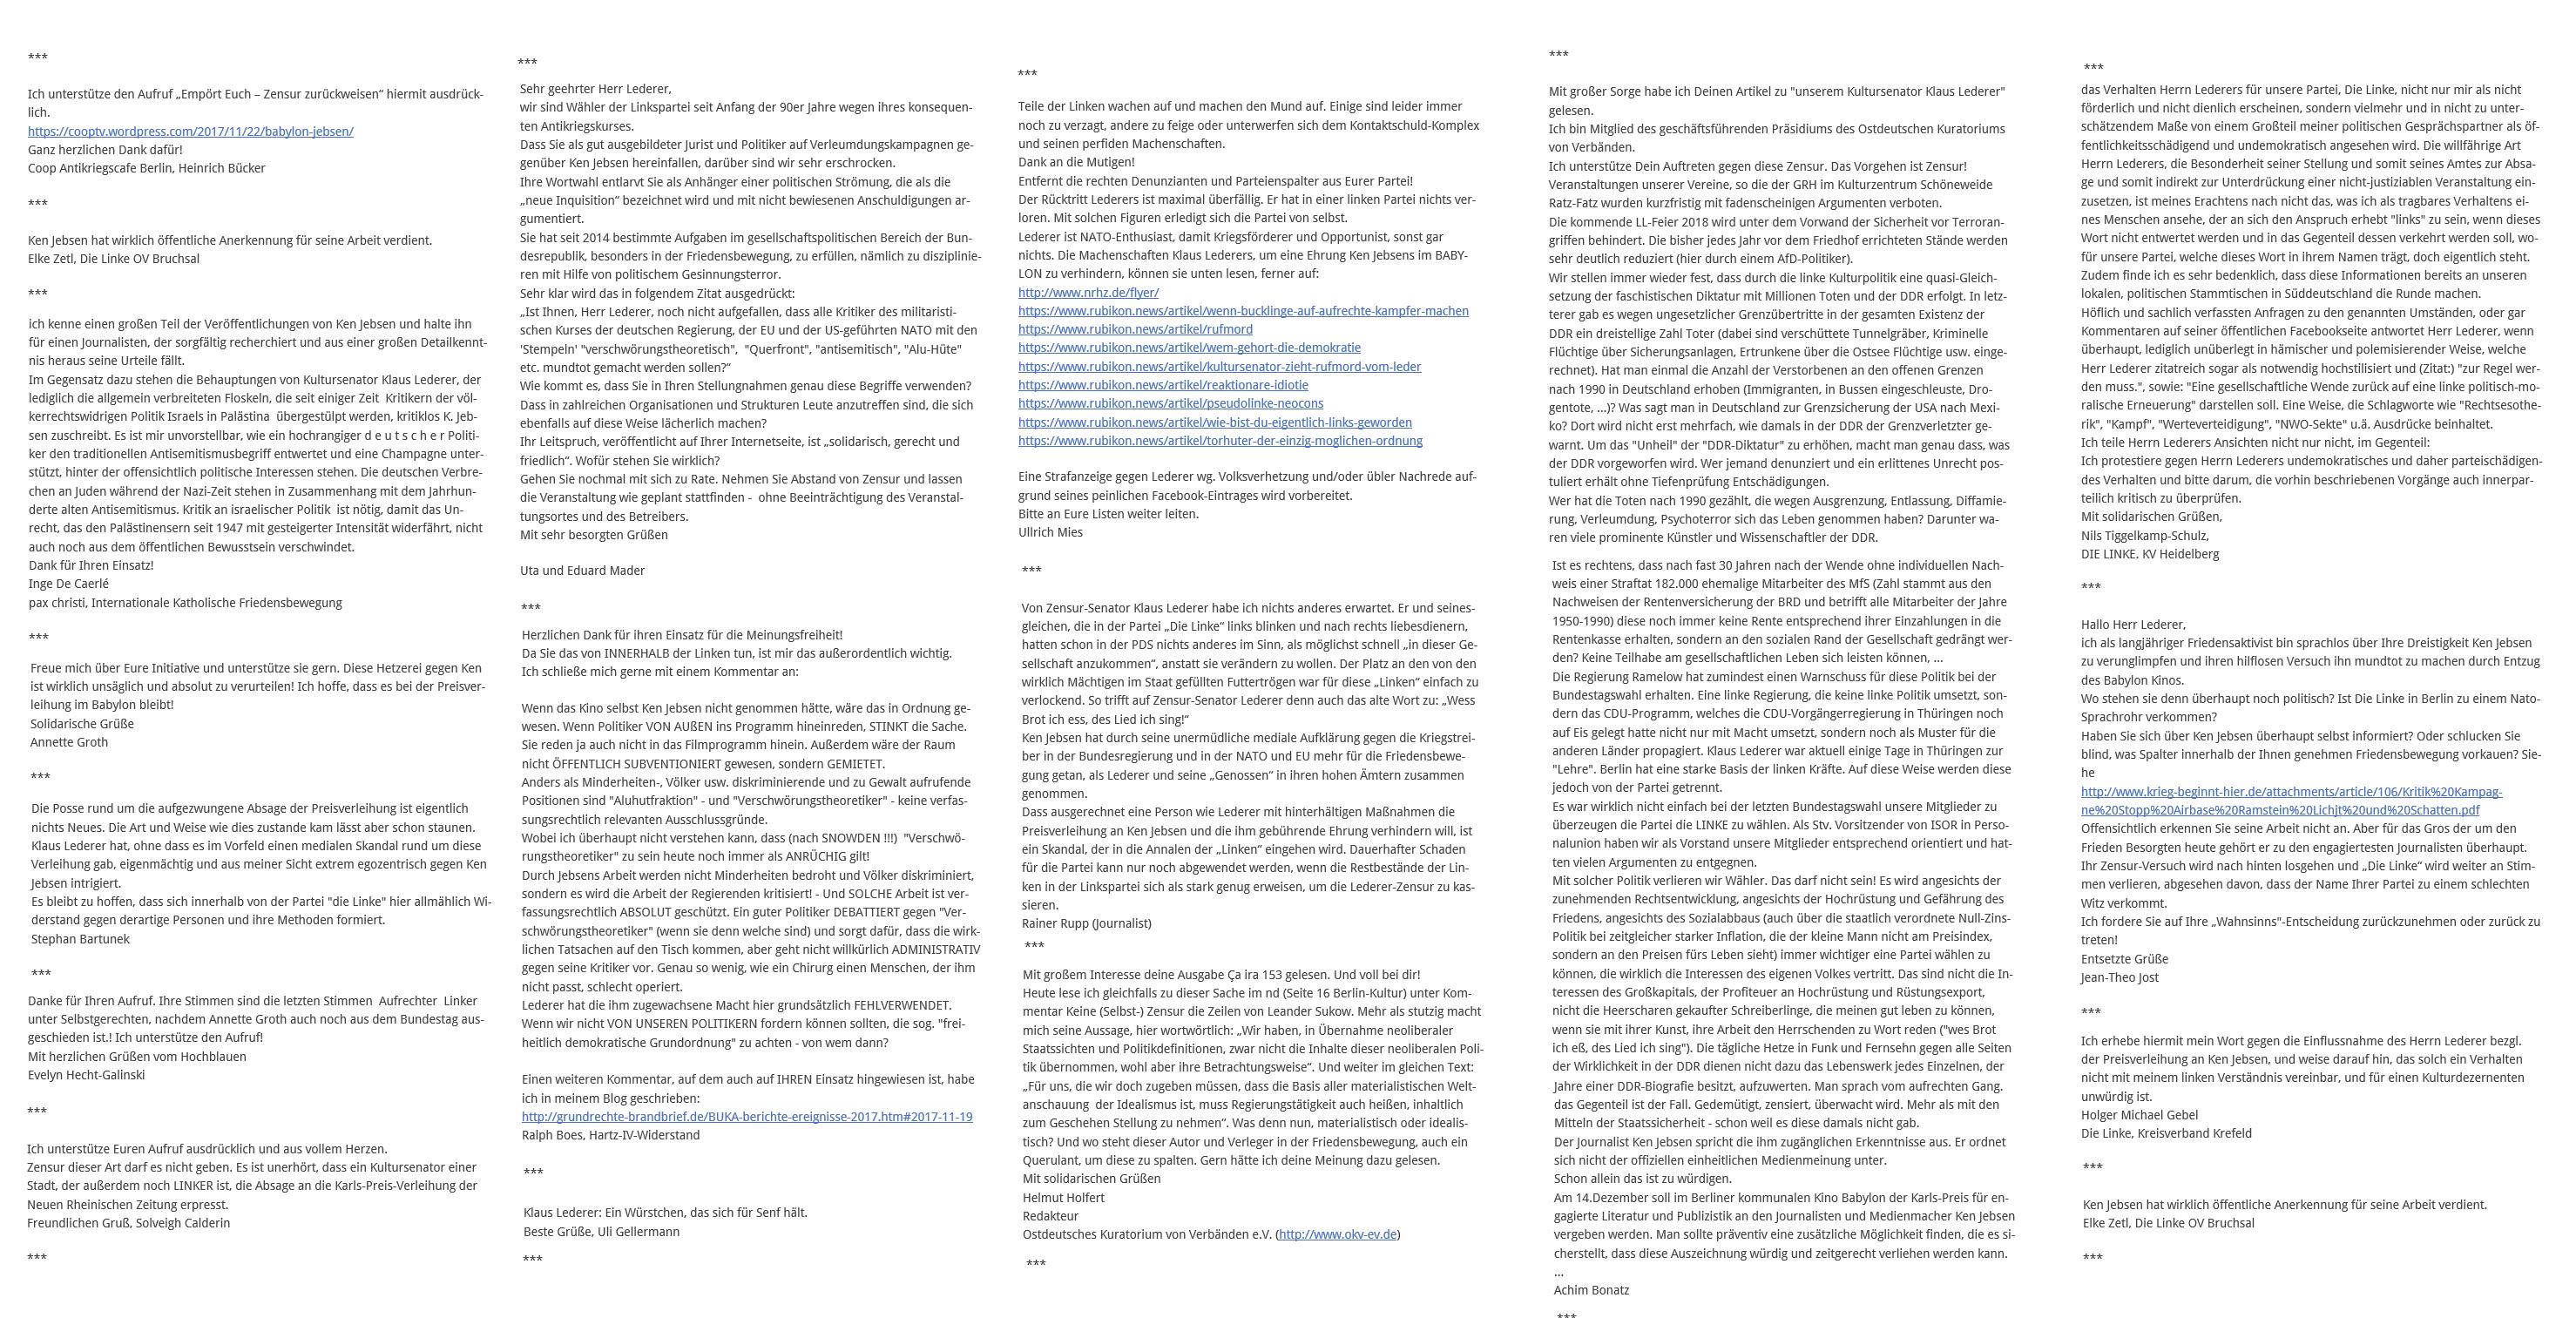 Auszug an Kommentaren unter dem Aufruf von Wolfgang Gehrcke